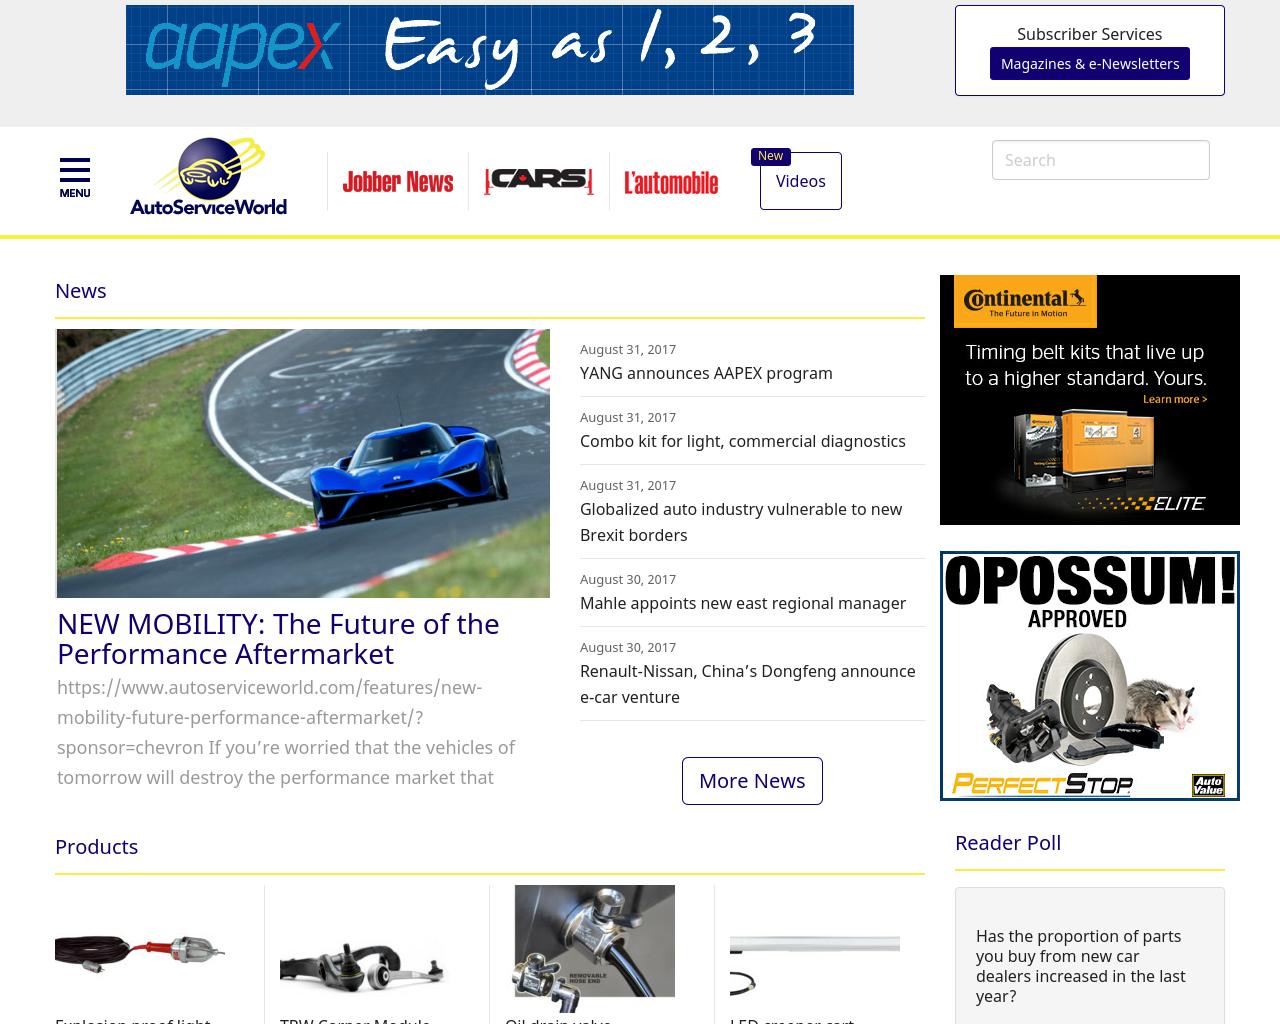 SSGM-Magazine-Advertising-Reviews-Pricing